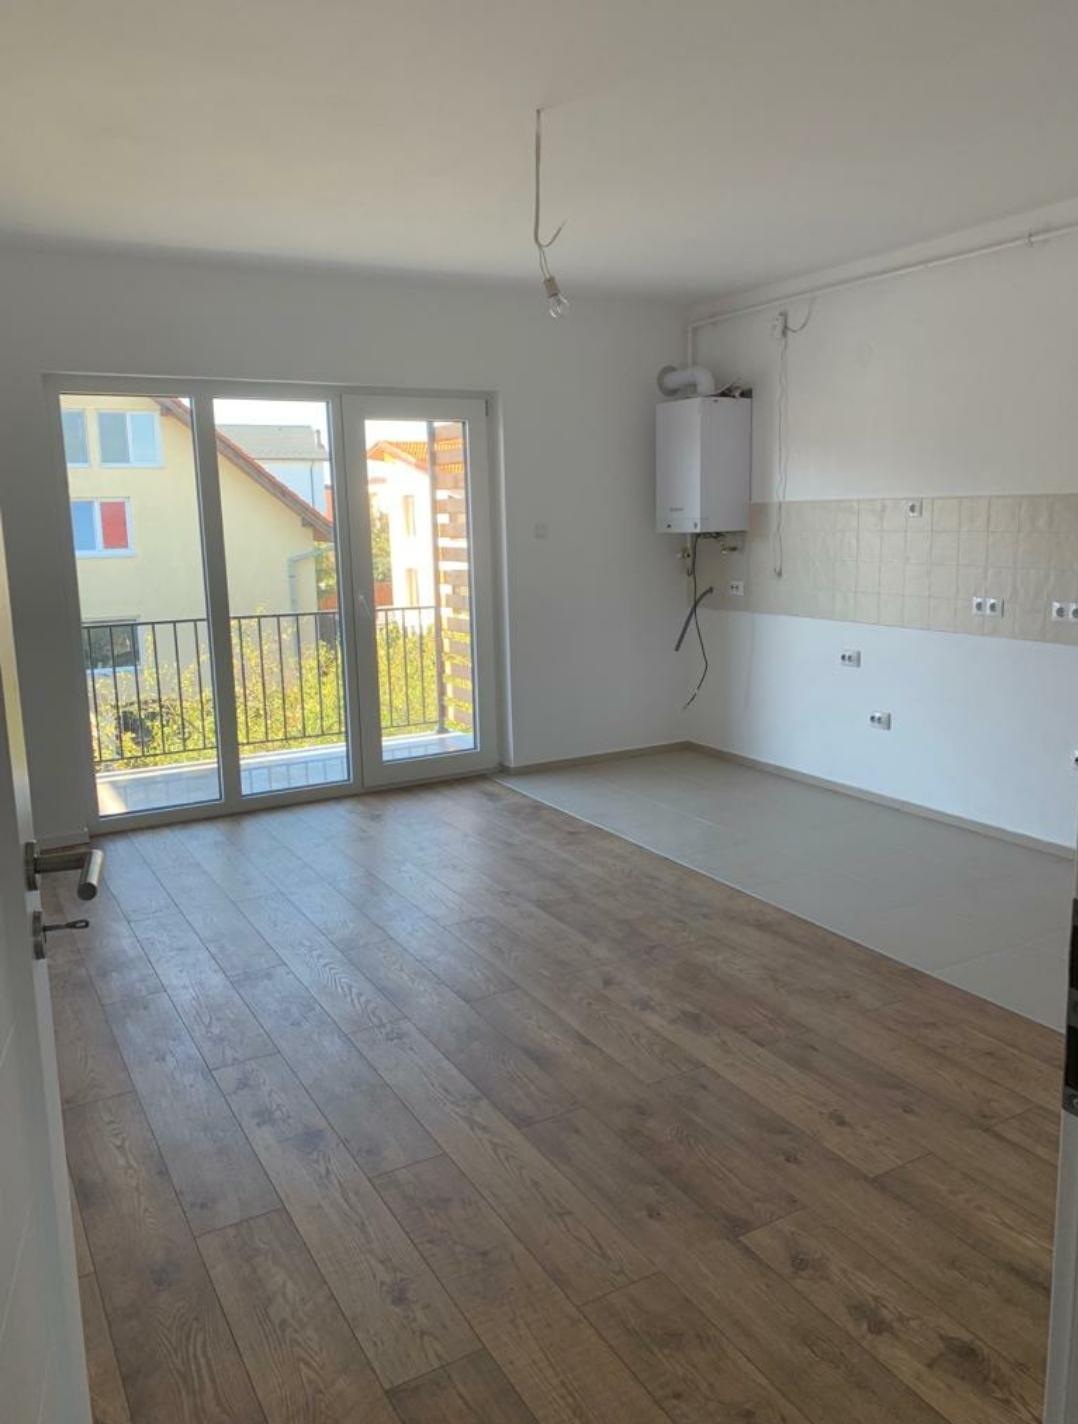 Selimbar Et.2 – Apartament MODERN 3 camere 2 bai+ terasa